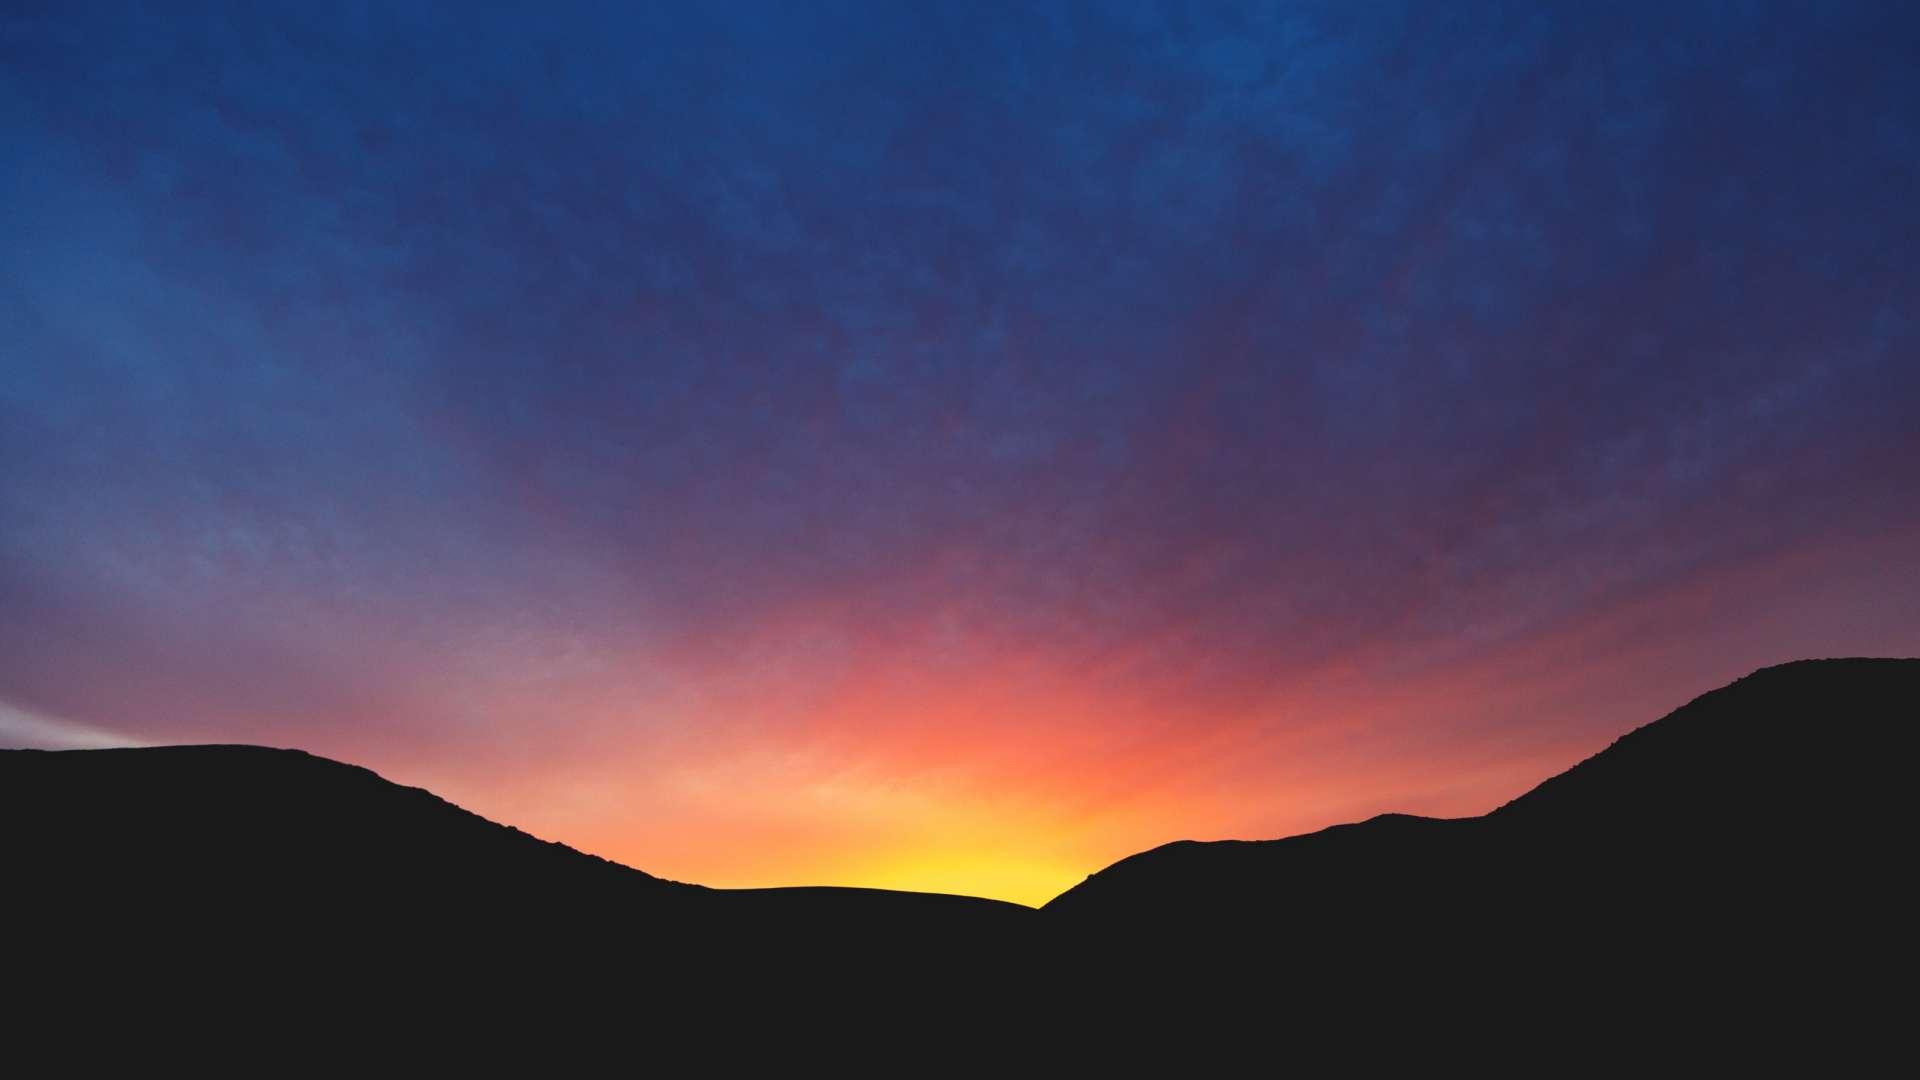 Mitos sobre o Propósito de Vida